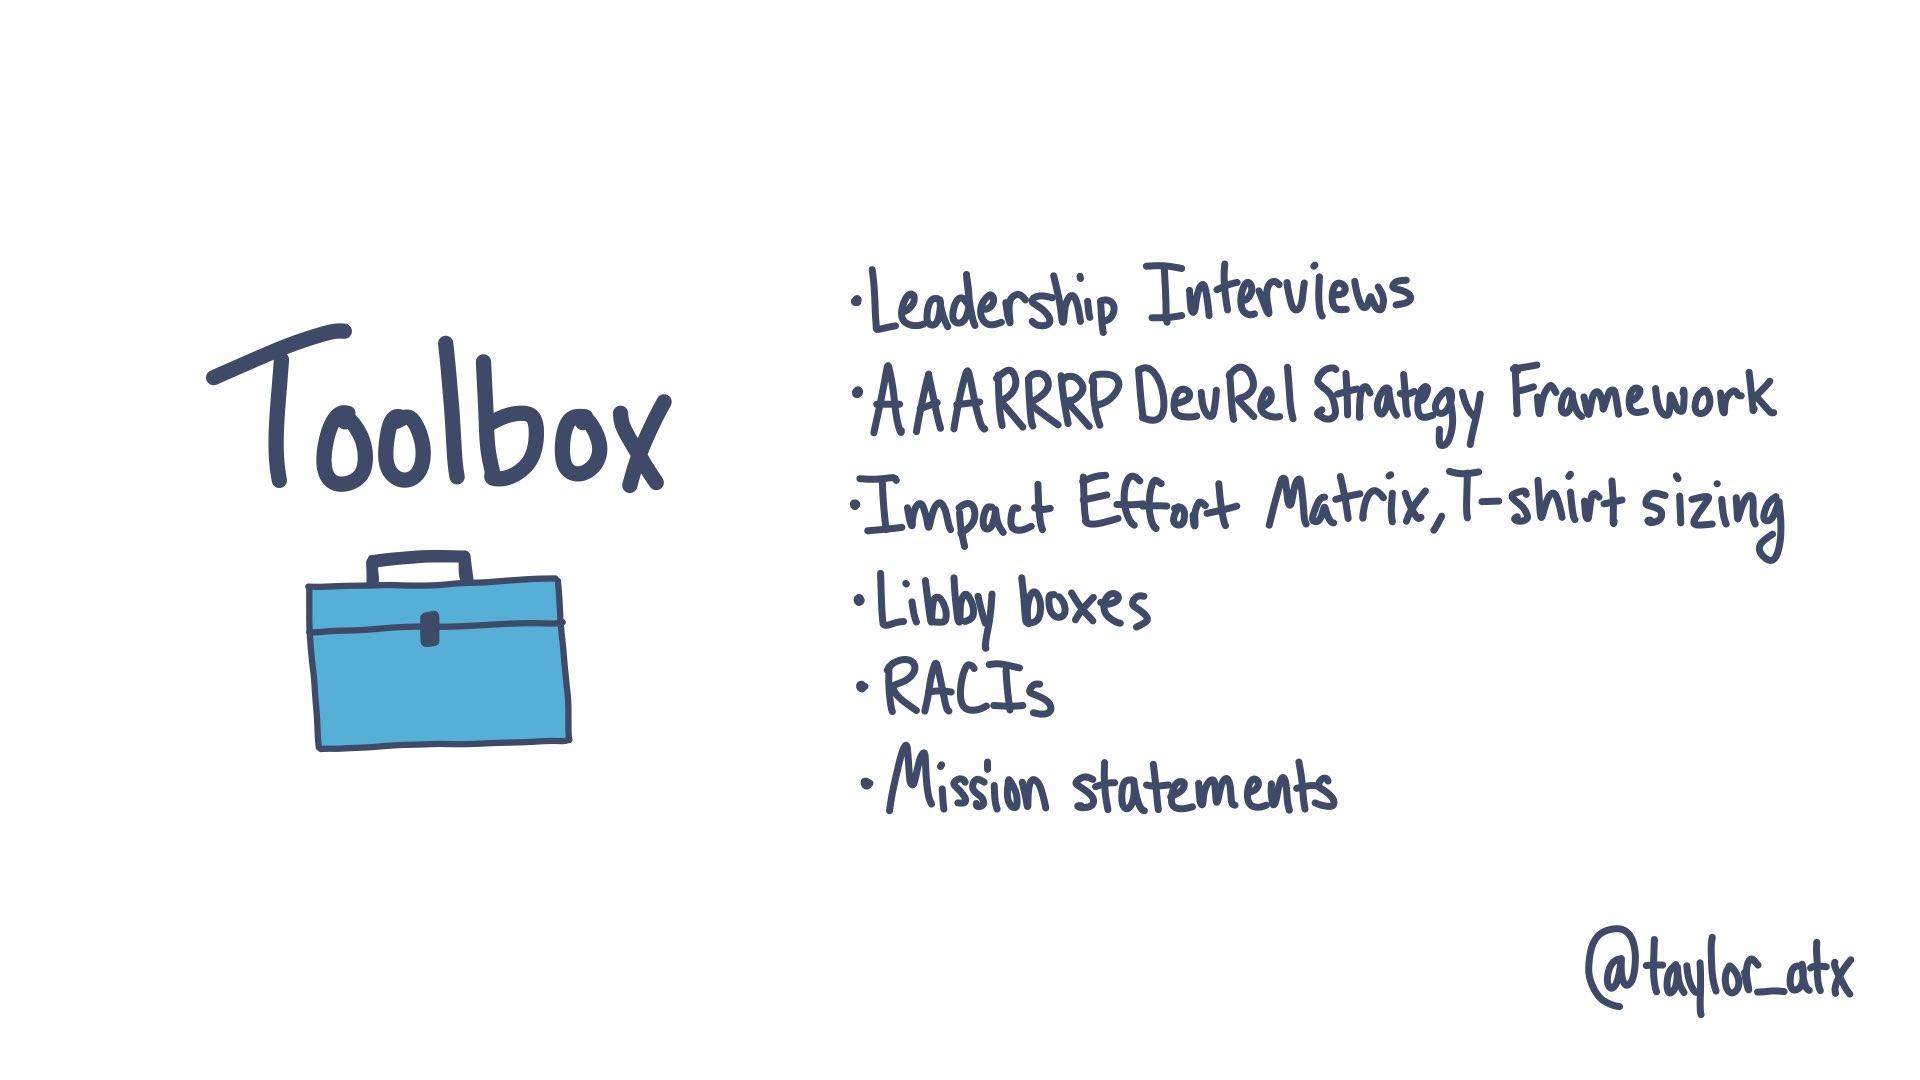 Toolbox: Leadership interviews, AAARRRP DevRel Strategy Framework, Impact Effort Matrix, t-shirt sizing, Libby boxes, RACIs, Mission statements